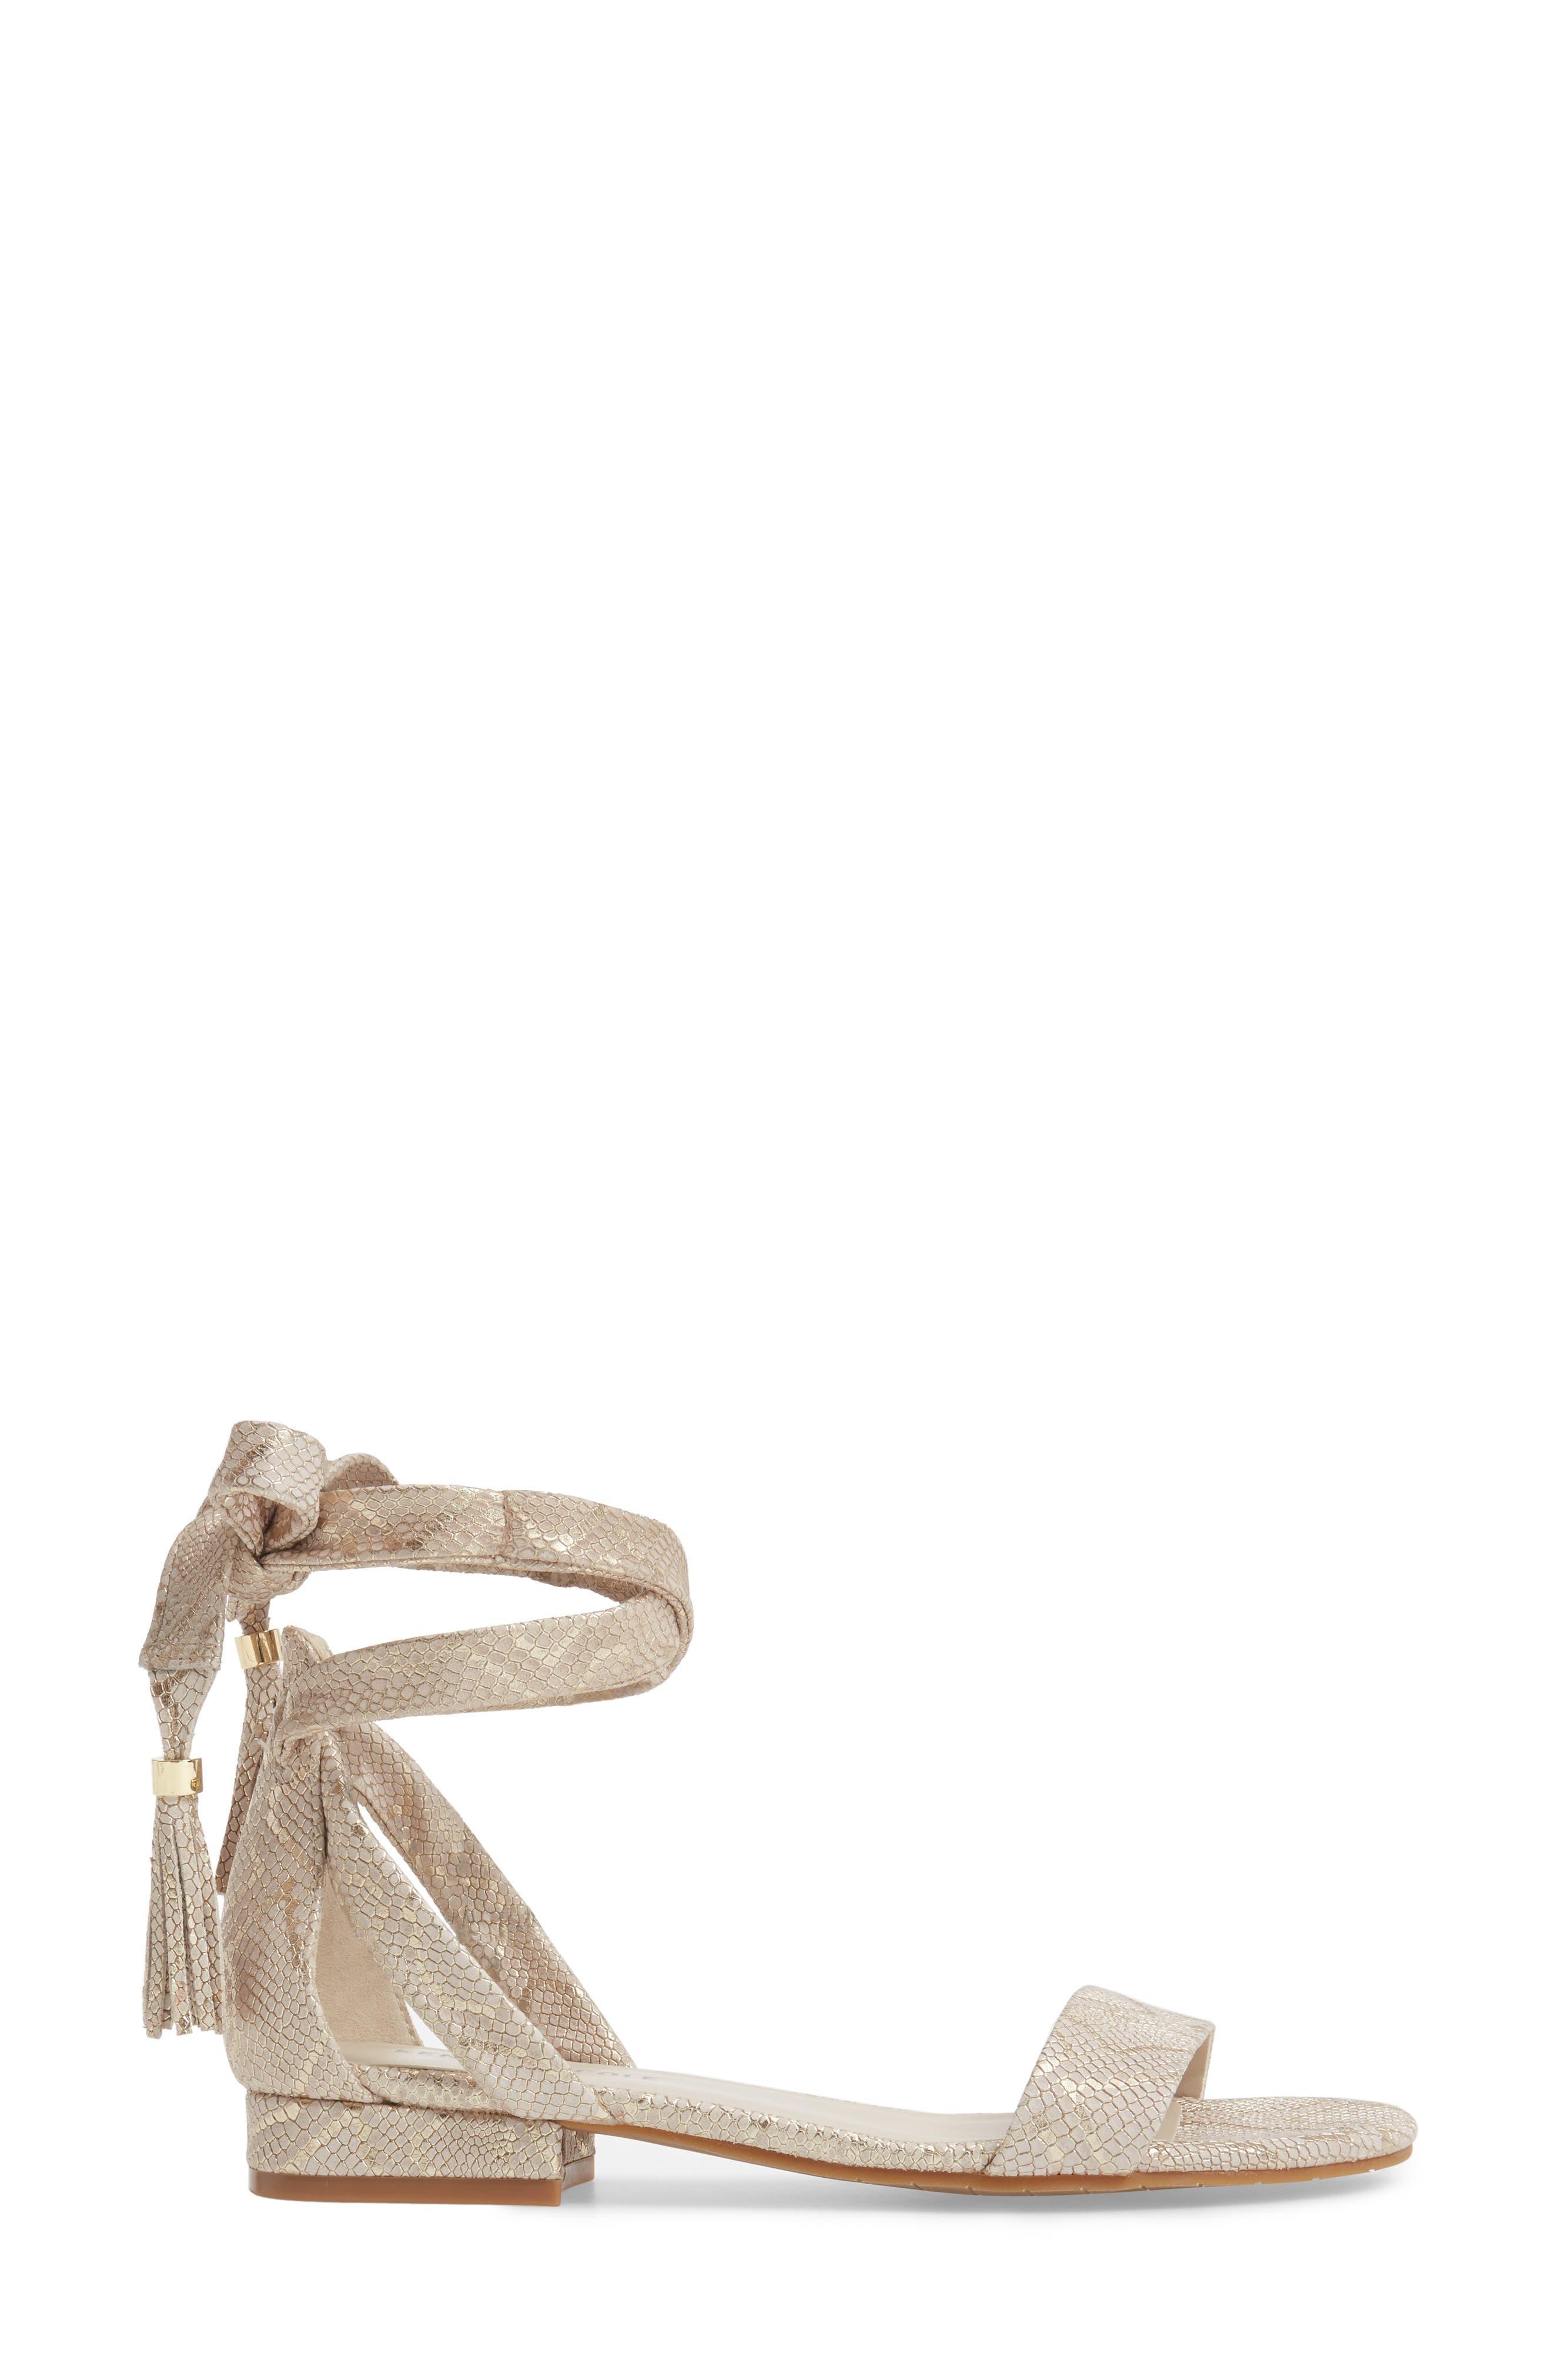 Valen Tassel Lace-Up Sandal,                             Alternate thumbnail 32, color,